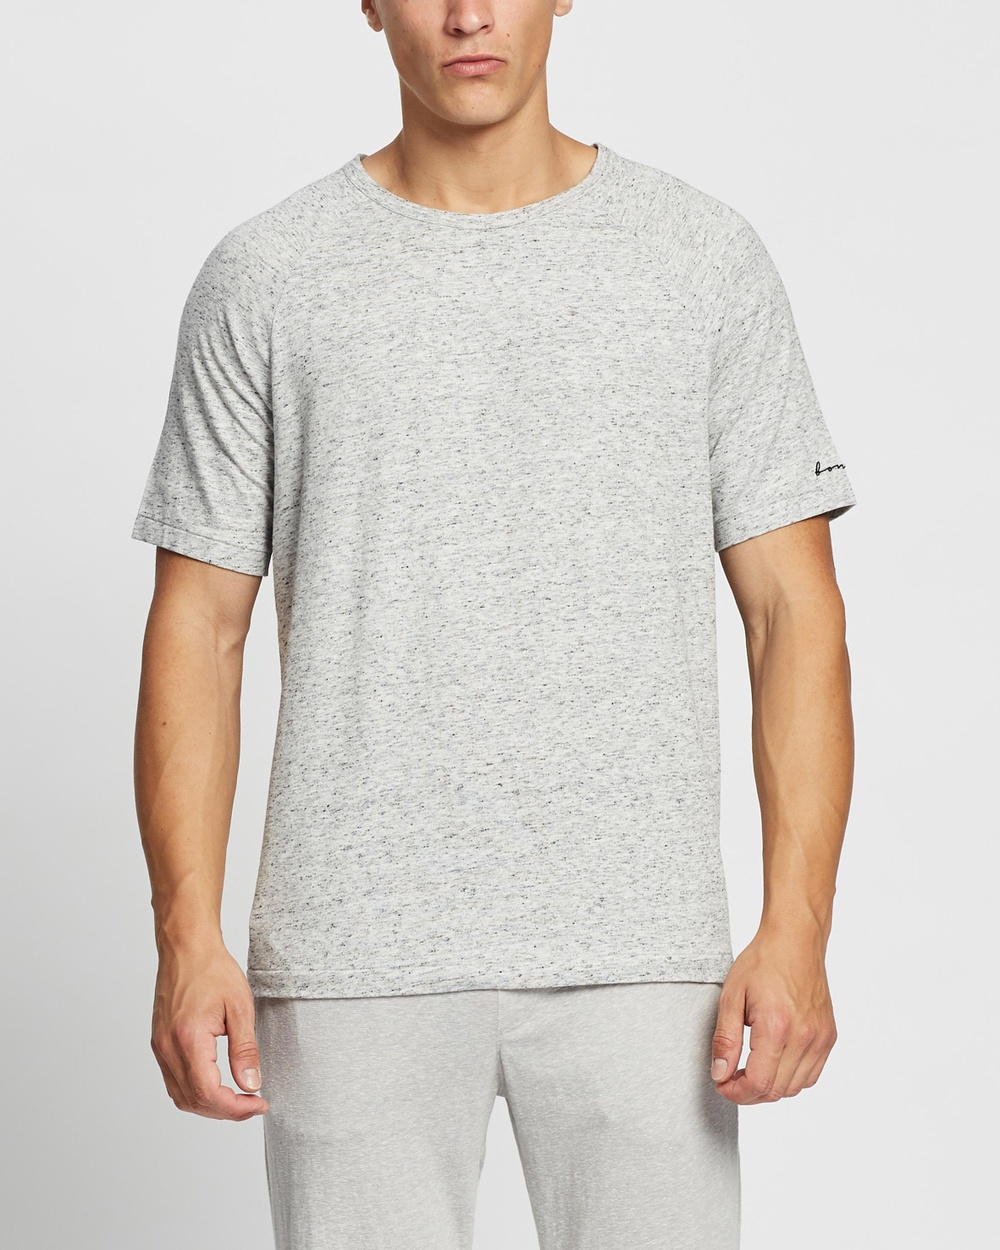 Bonds - Comfy Livin' Jersey Tee - T-Shirts & Singlets (Lazy Marle) Comfy Livin' Jersey Tee